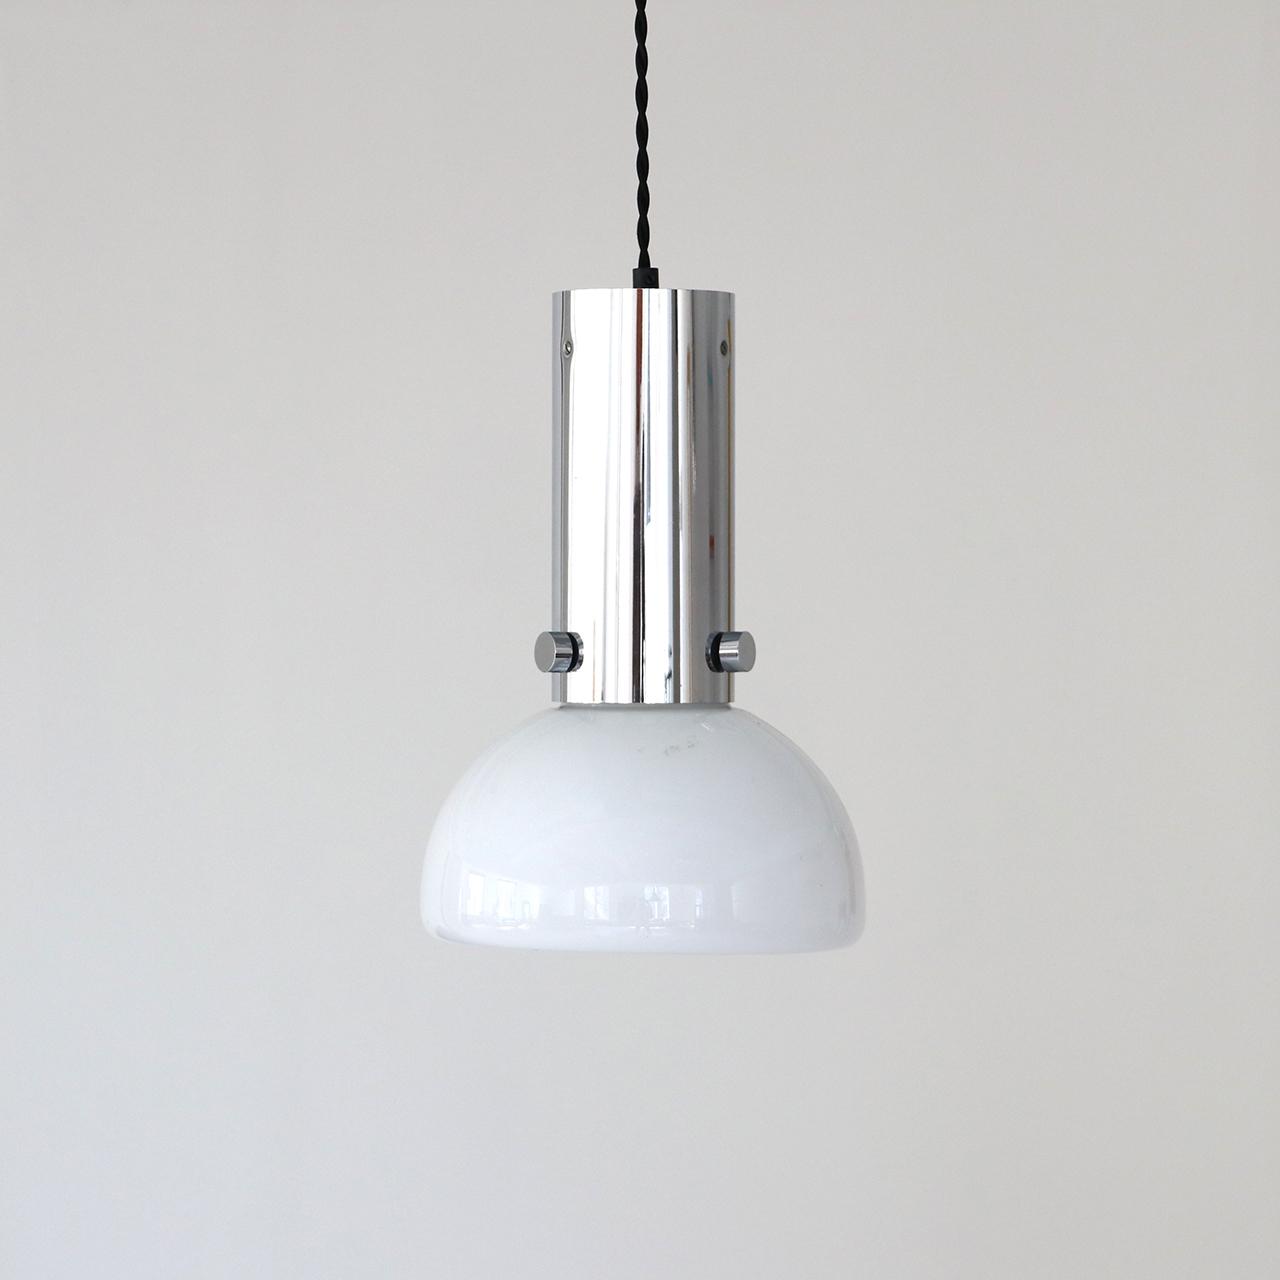 Pendant lamp / Limburg